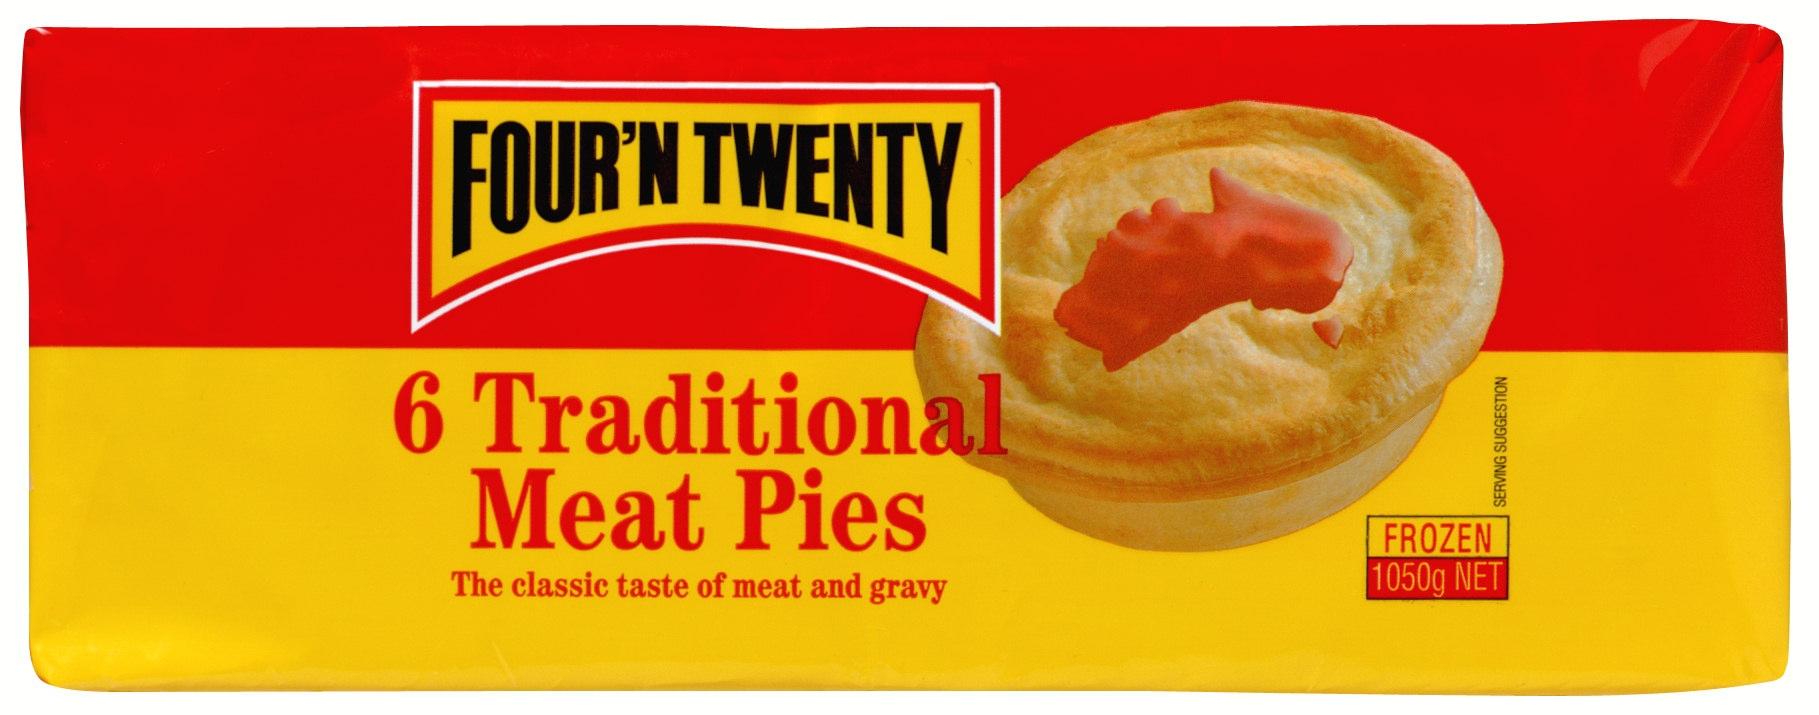 Takata Airbag >> Patties Foods Ltd—Four 'n Twenty Meat Pies | Product ...